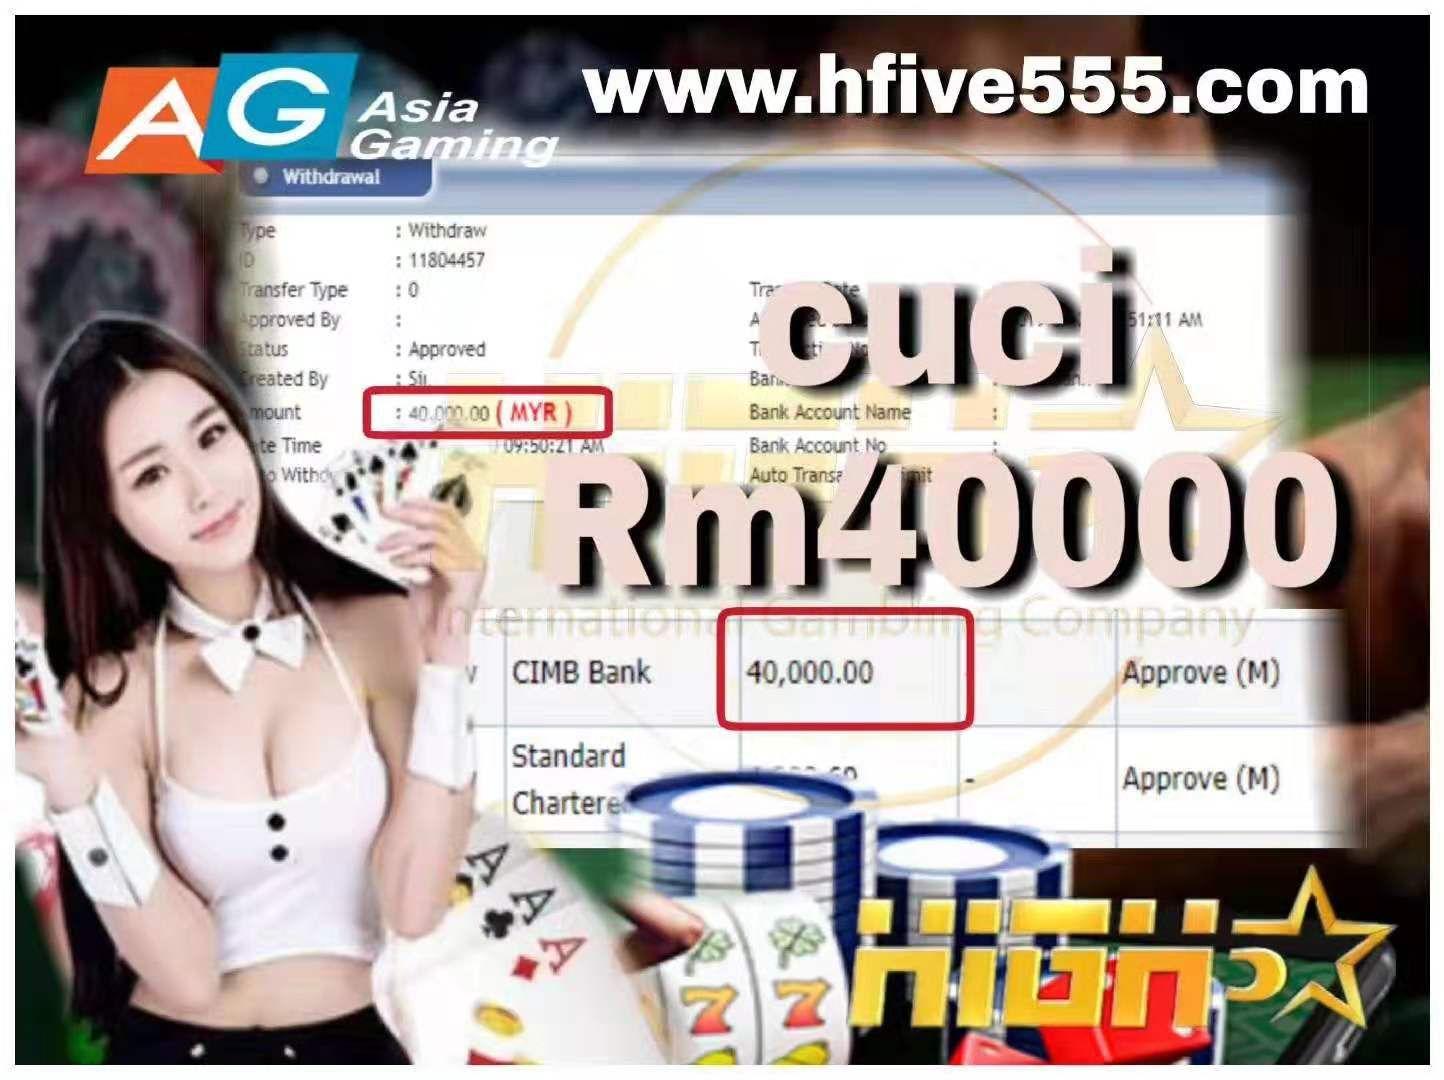 ASIA GAMING    Live BACCARAT, Live Casino   Tahniah boss cuci Rm40000  Nak cuba luck cepat register dlm website kita ✅ 5Times withdraw limit ✅ Max withdraw up to Rm50000 #百家乐#轮盘#4d#roulette#baccarat#onlinecasino#sgonlinecasino#sbobet#poker#sportbook#casino malaysia#mega888#joker#toto#magnum4d#jackpot#pussy888#greatwall#bonus#rebate#turnover#slot